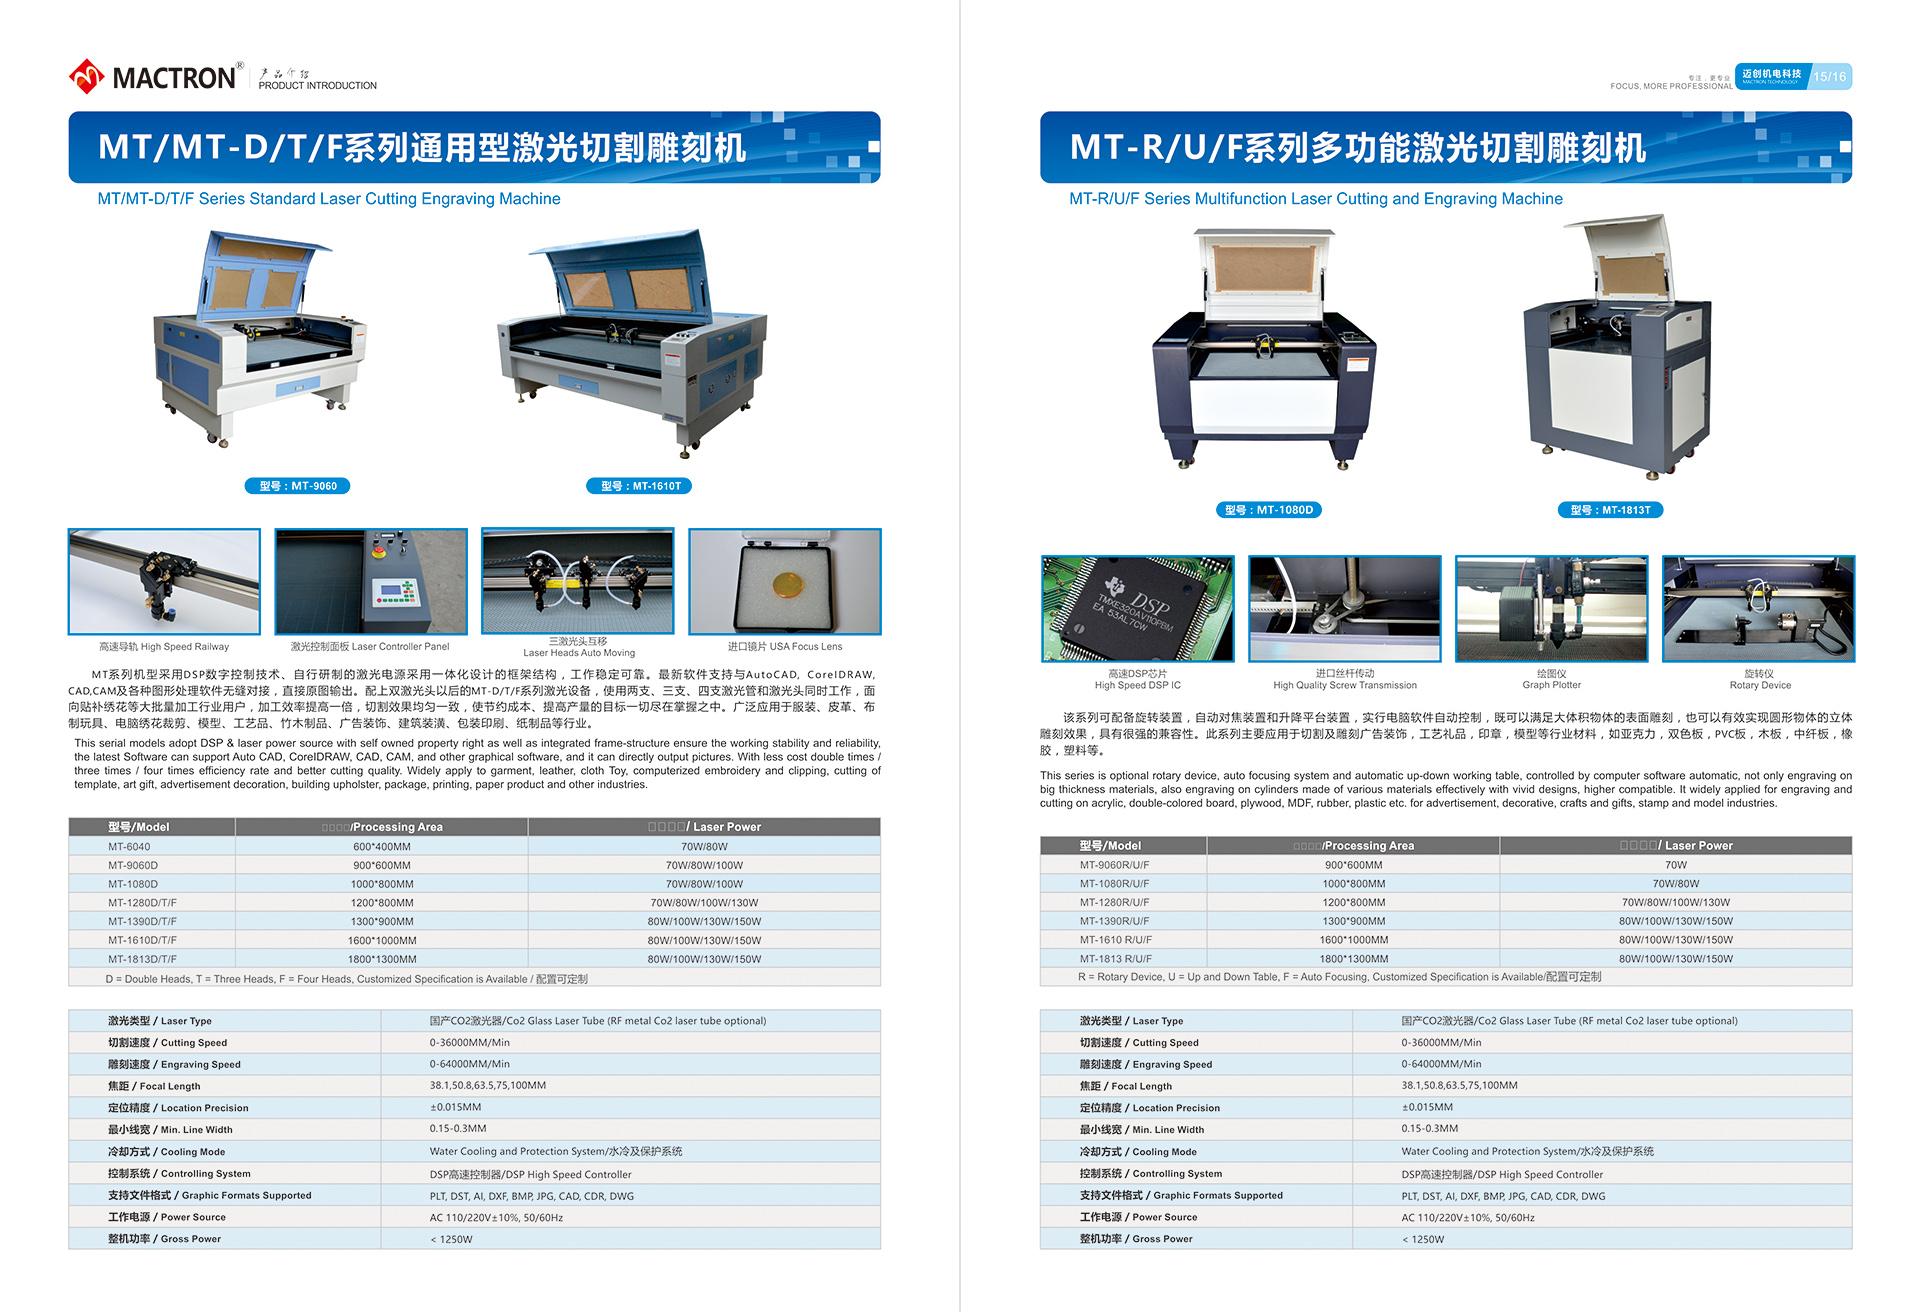 Mactron Tech Laser Catalogue 2017 (9)